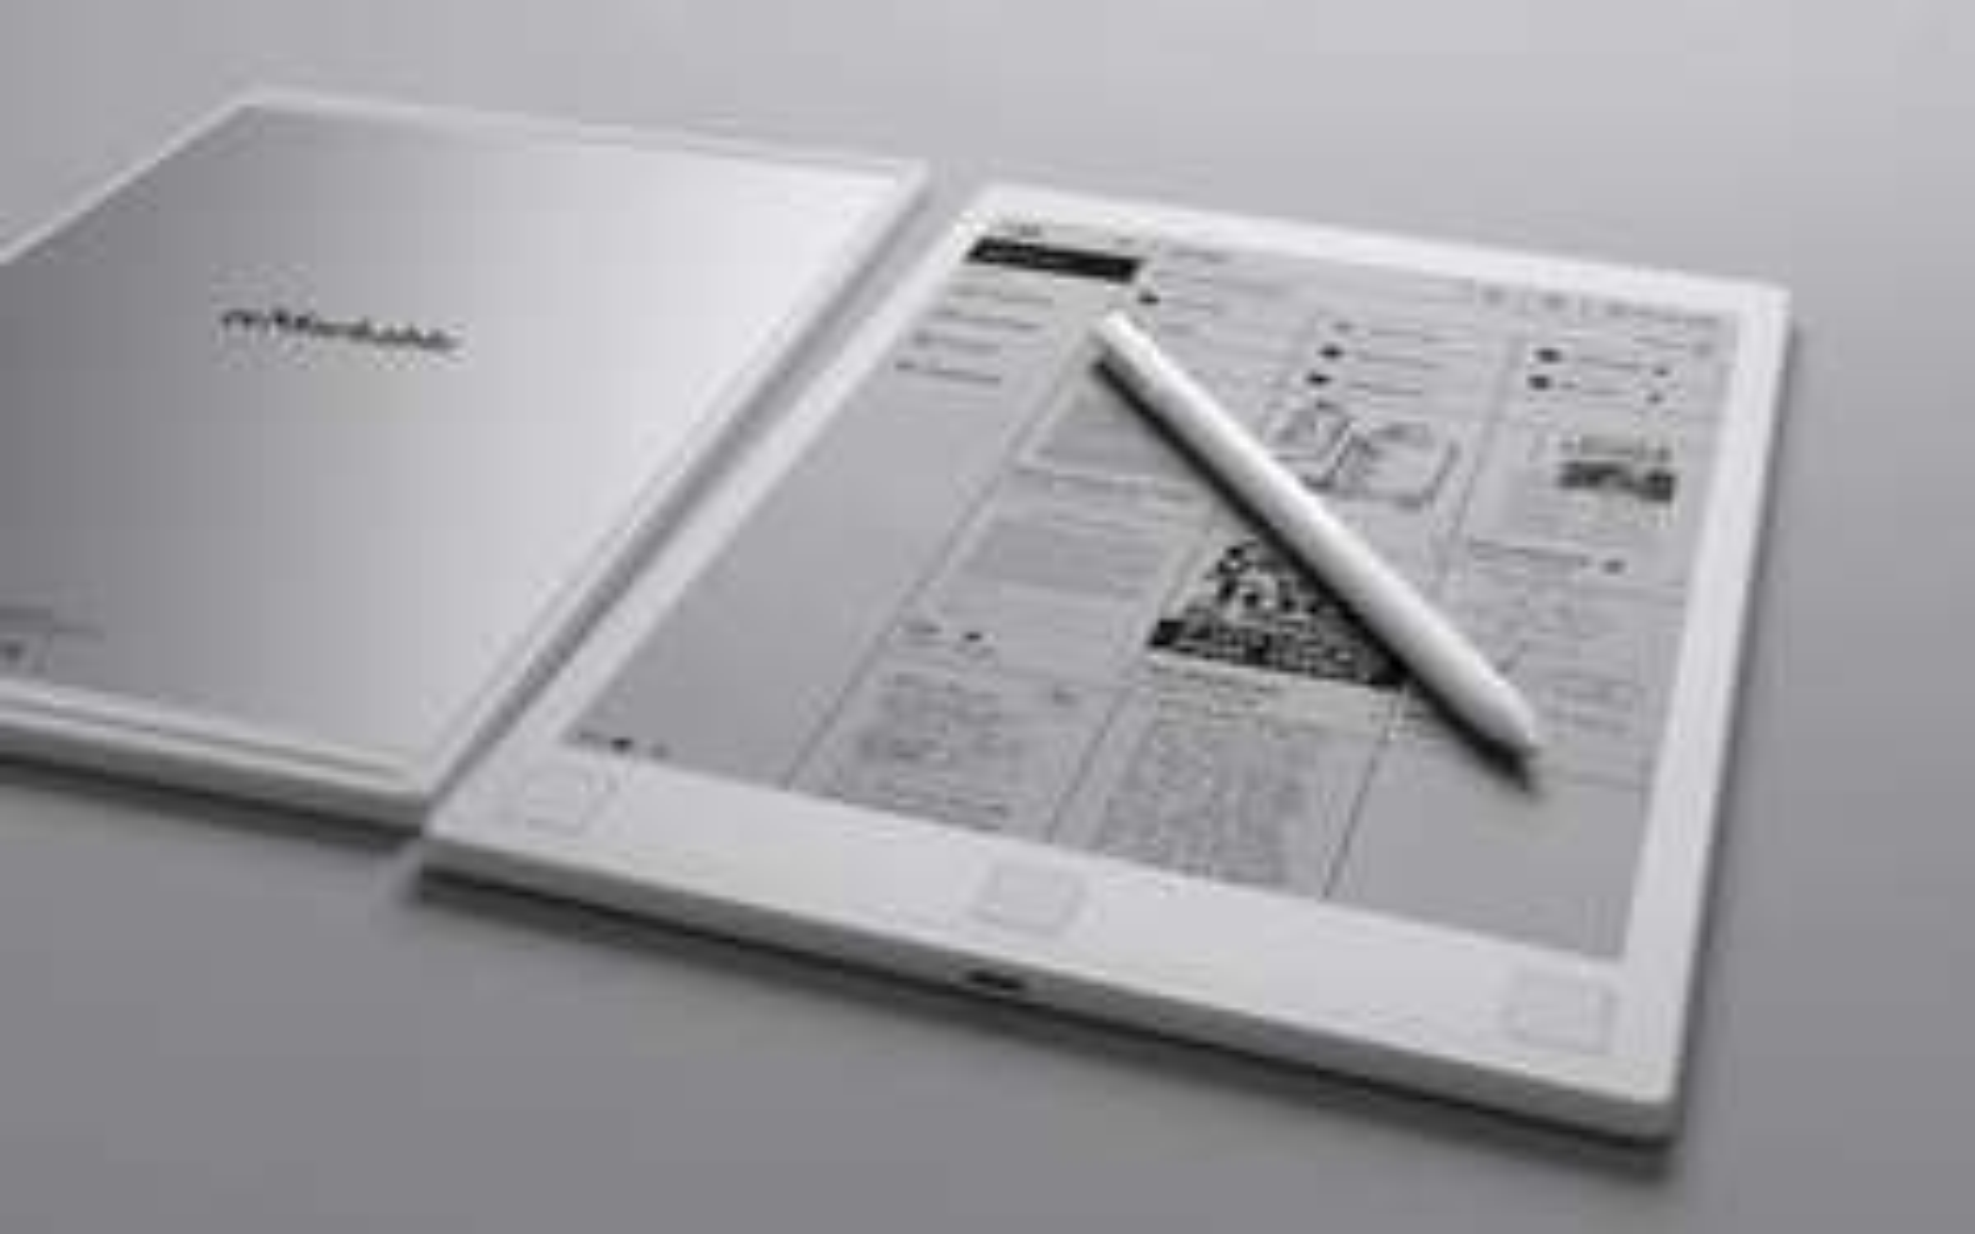 "Remarkable | digitales Notizbuch | 10,3"" | DIN A5 | inkl. Stift - Black Friday Deal"